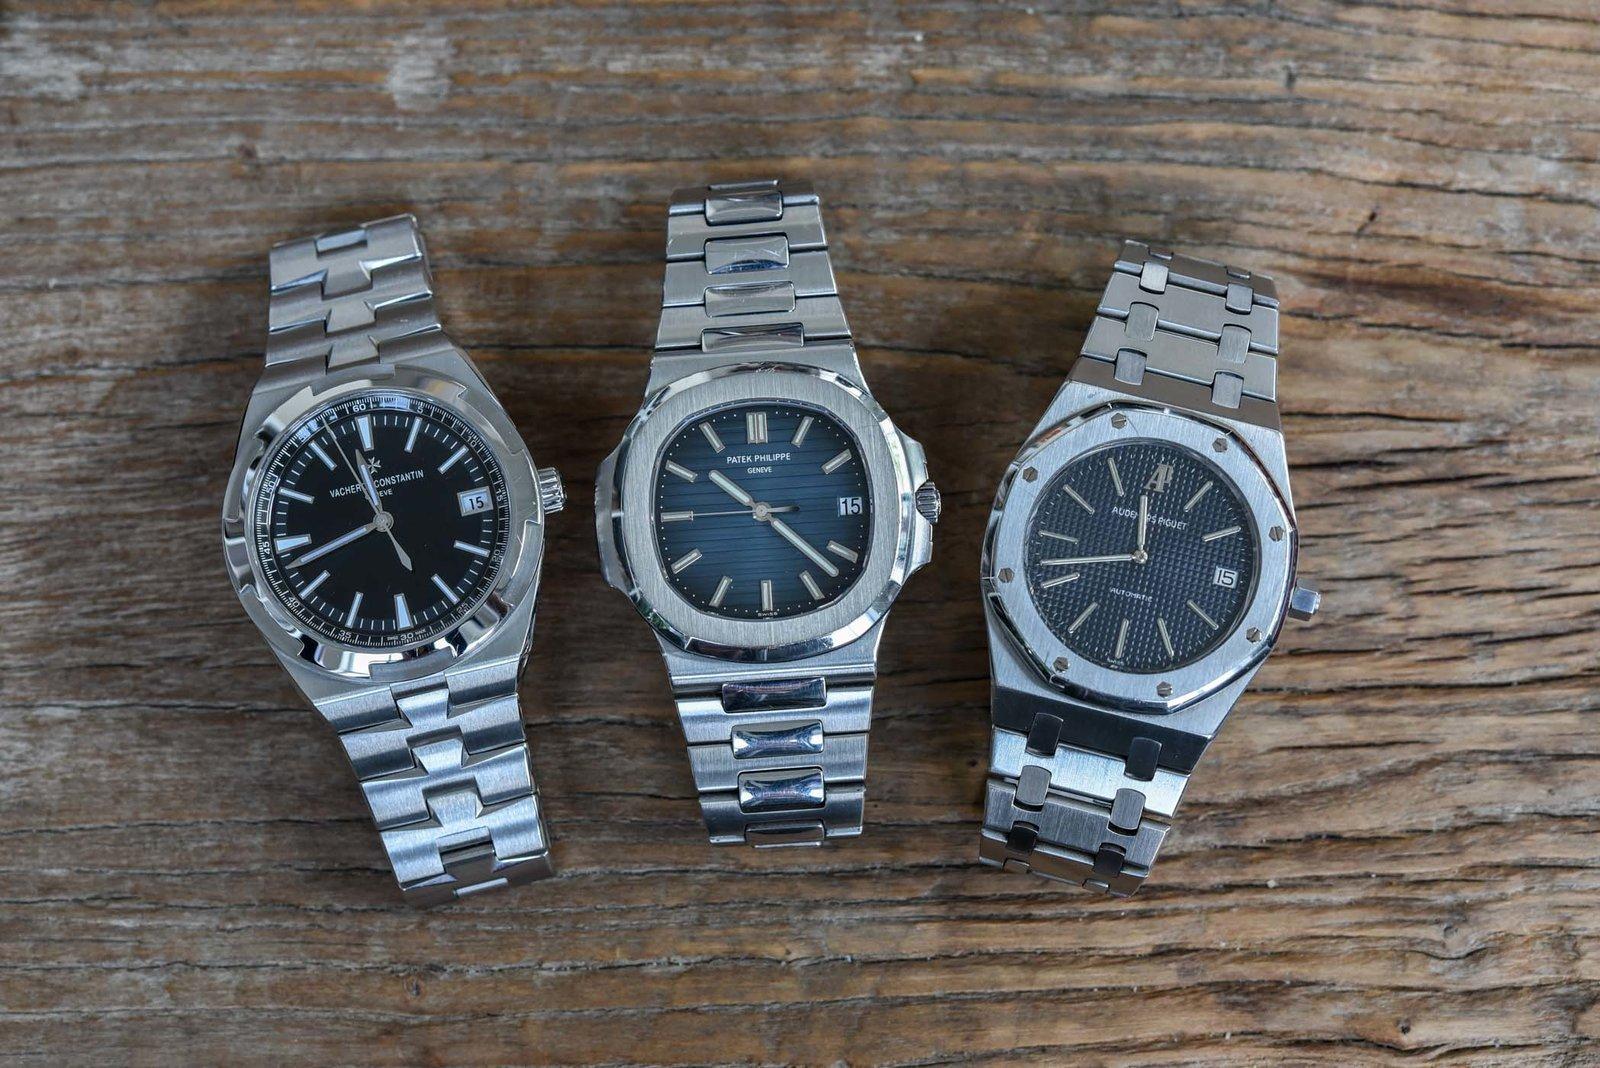 Buying-Guide-Luxury-Sports-Watches-Holy-Trinity-Patek-Vacheron-Audemars.jpg